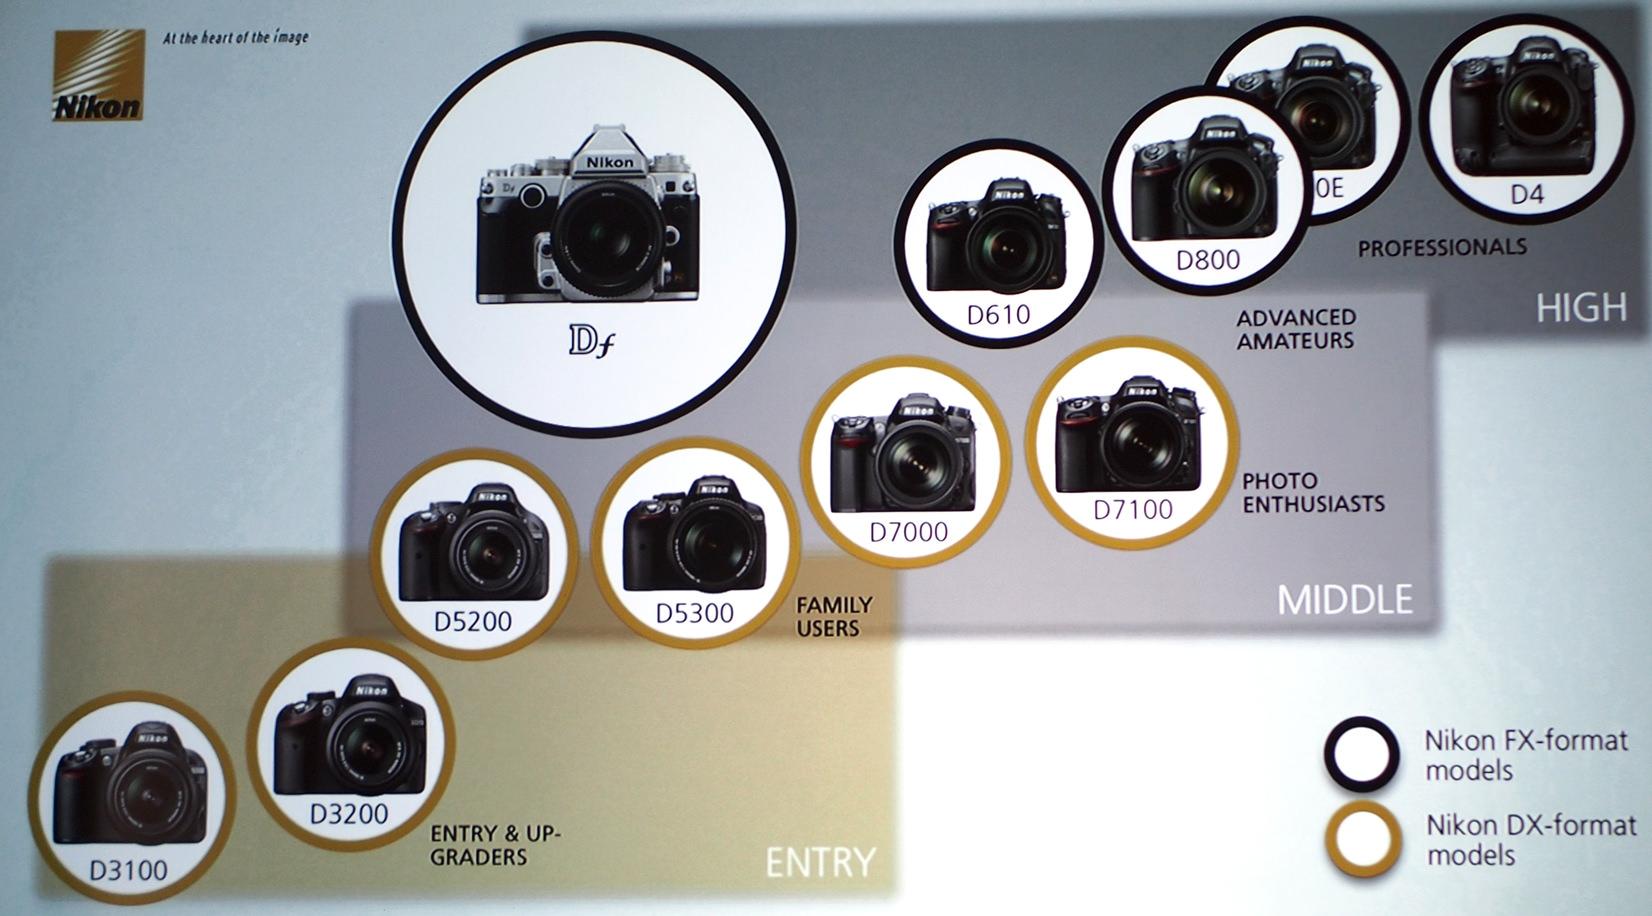 Camera Nikon Dslr Camera Range nikon df classic digital slr announced the national photographic lineup dslr range